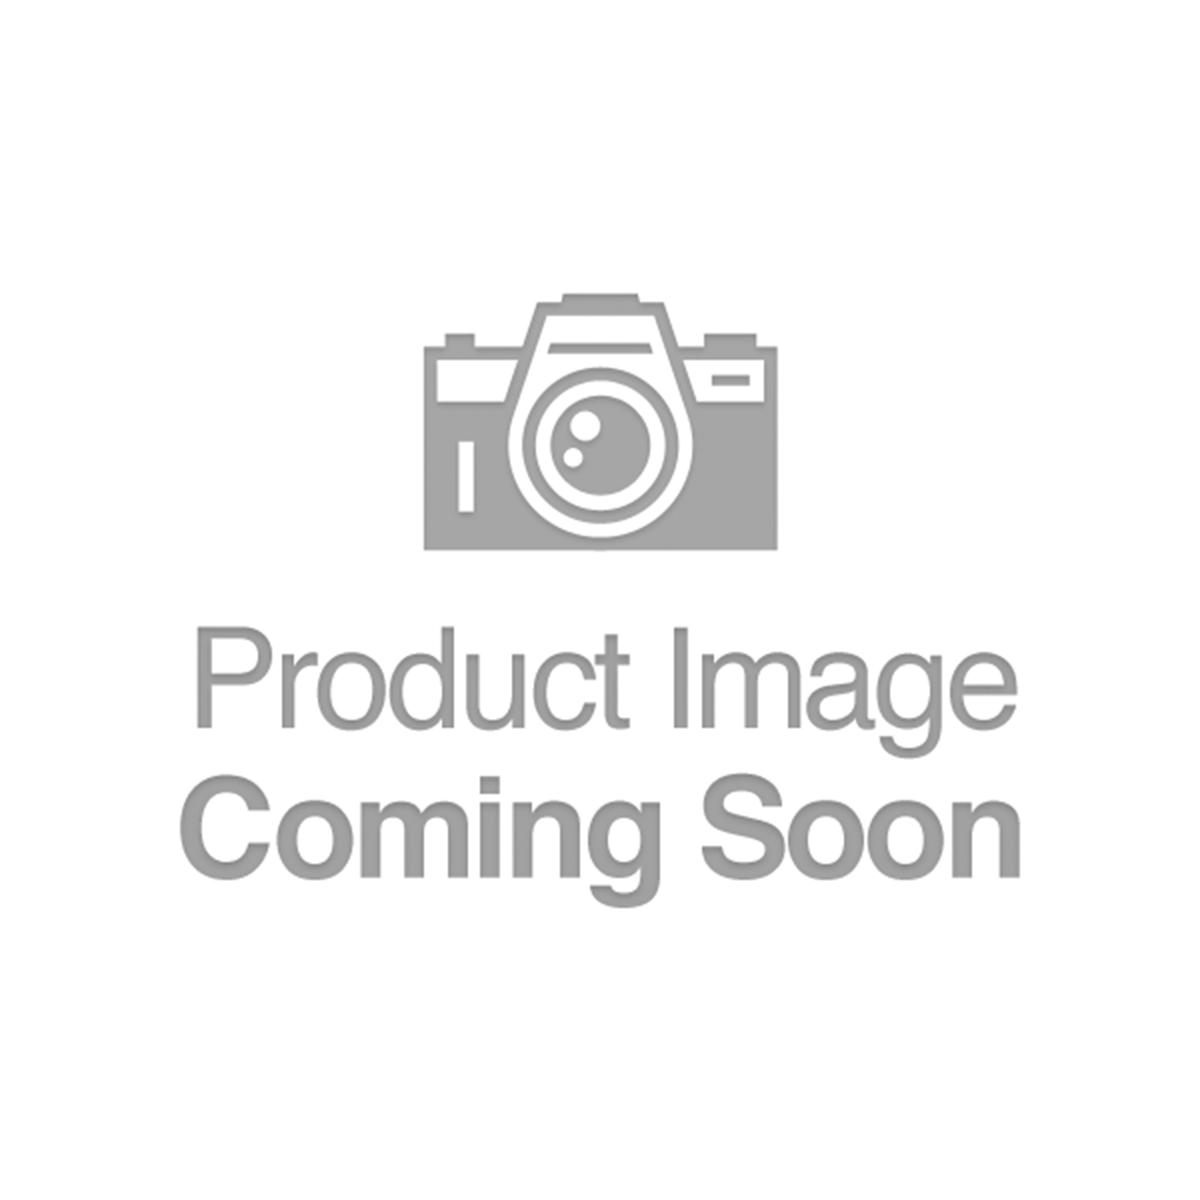 1865 3CN Three Cent Nickel PCGS MS64